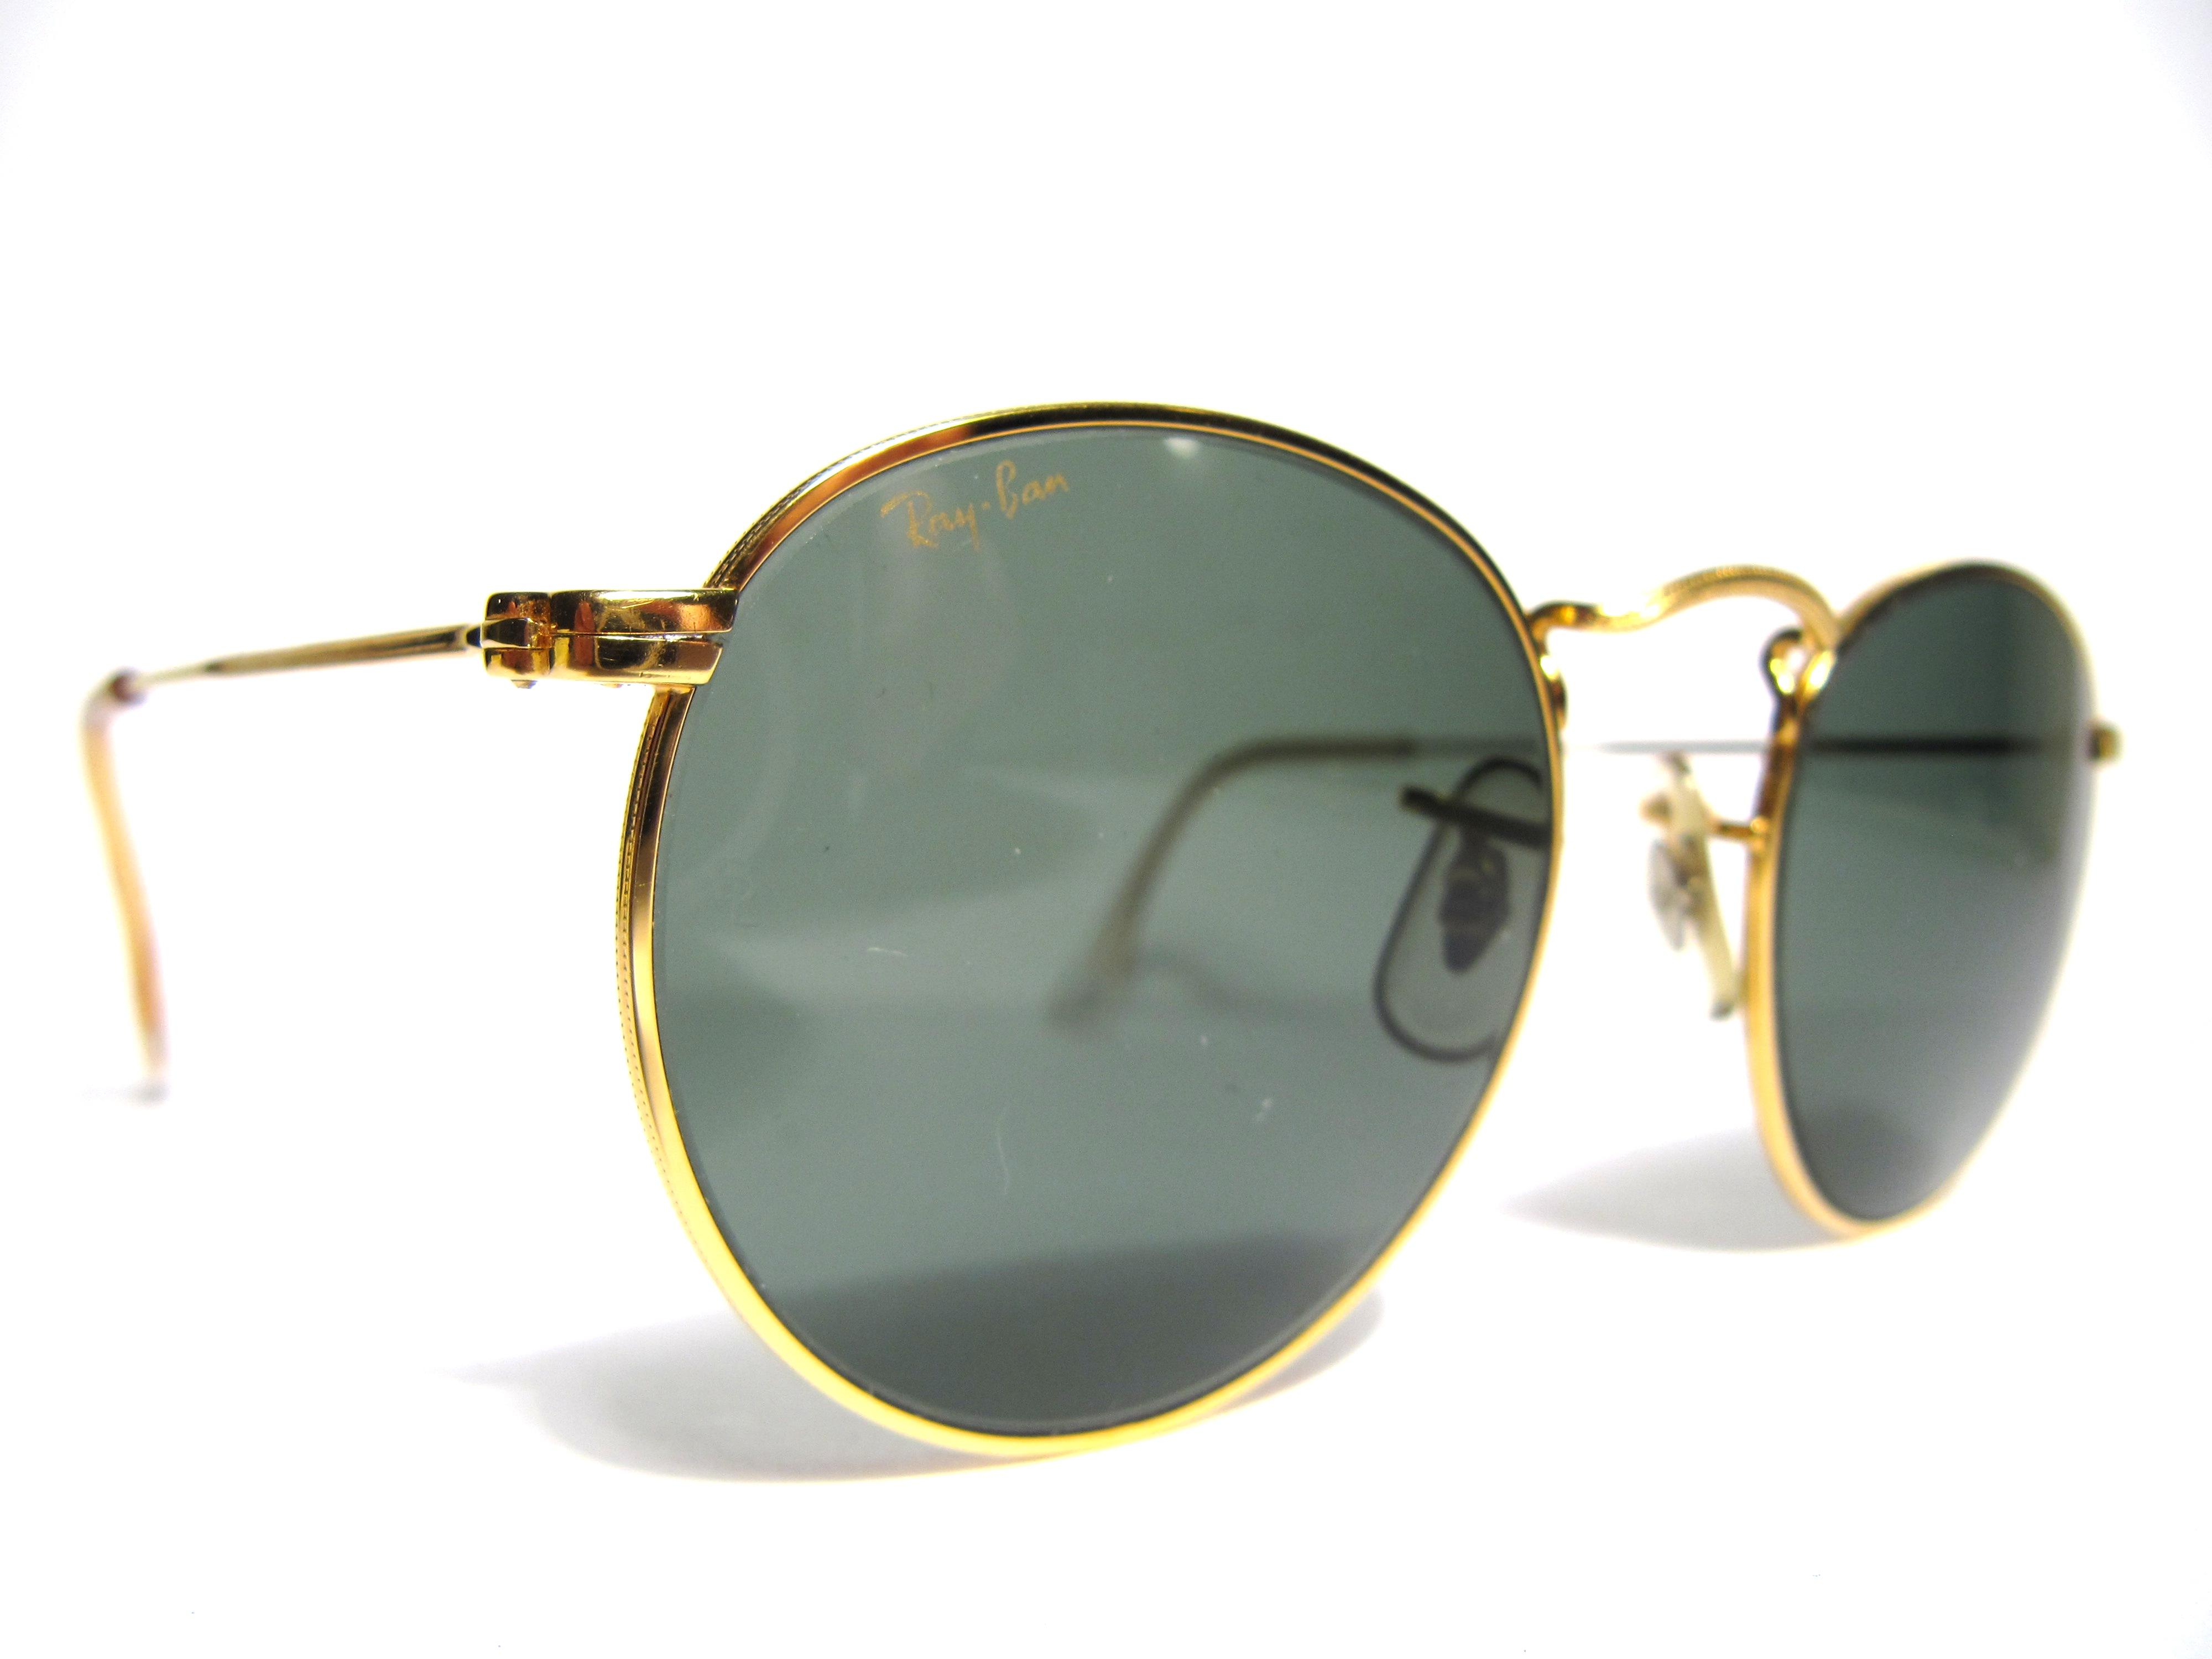 Ray Ban Vintage Glasses Frames : Vintage Frames: Ray Ban Smith&Brandon